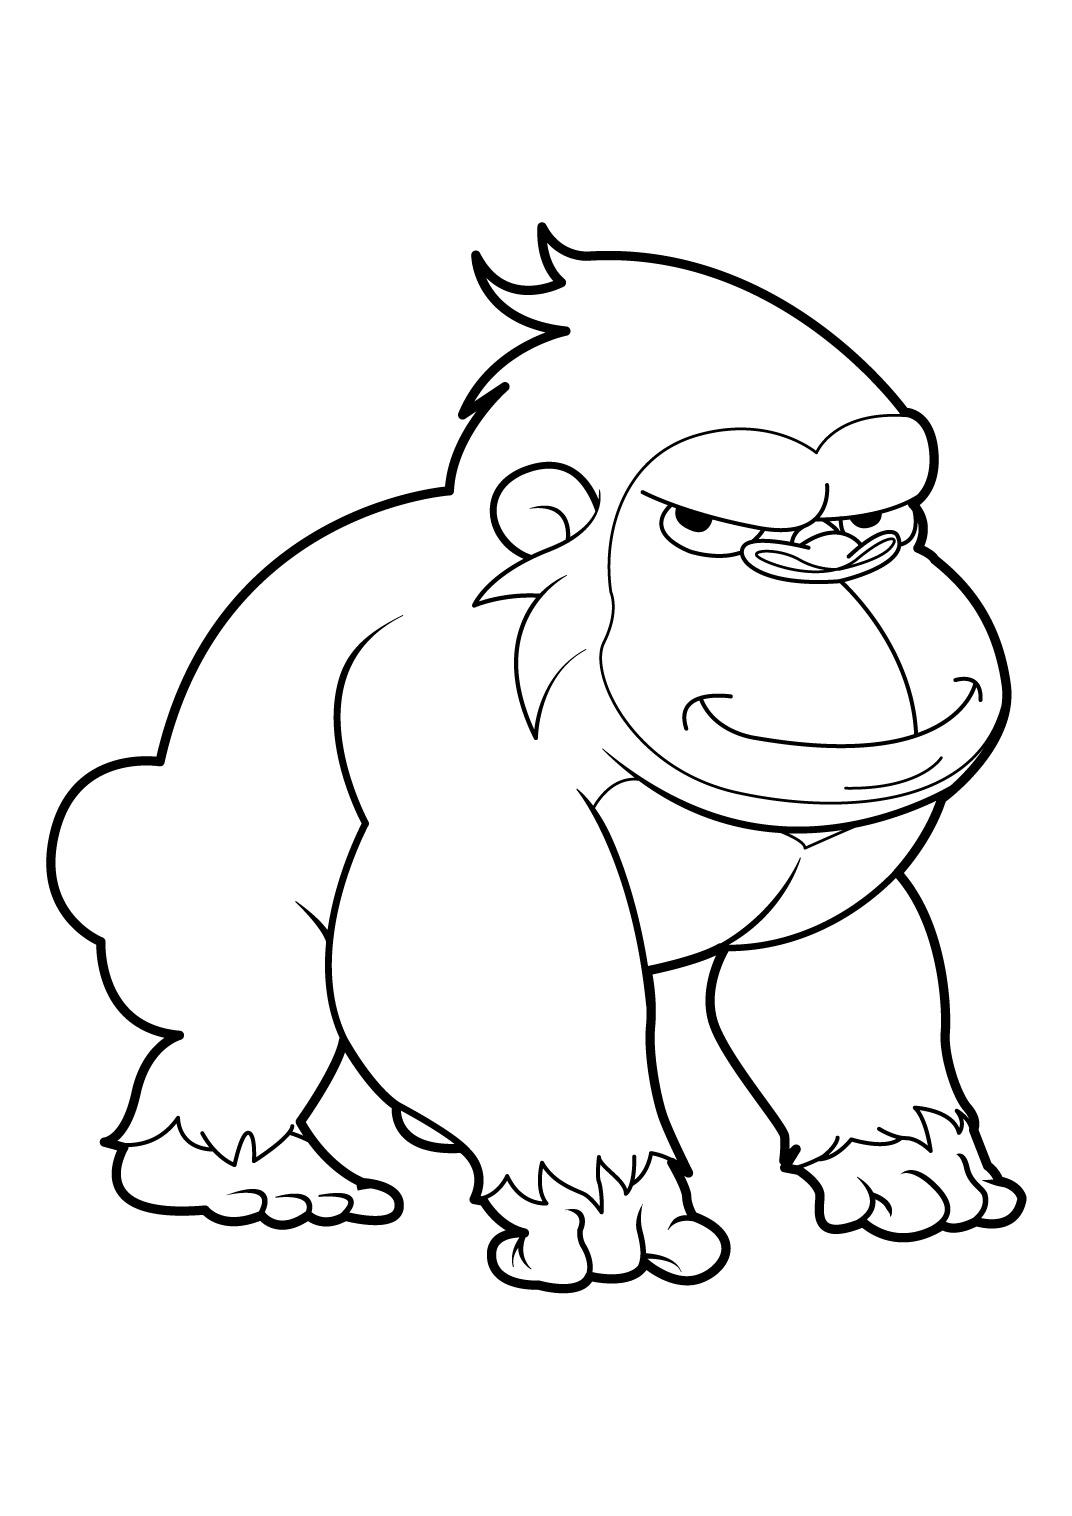 Coloriage un singe - Dessin imprimer ...